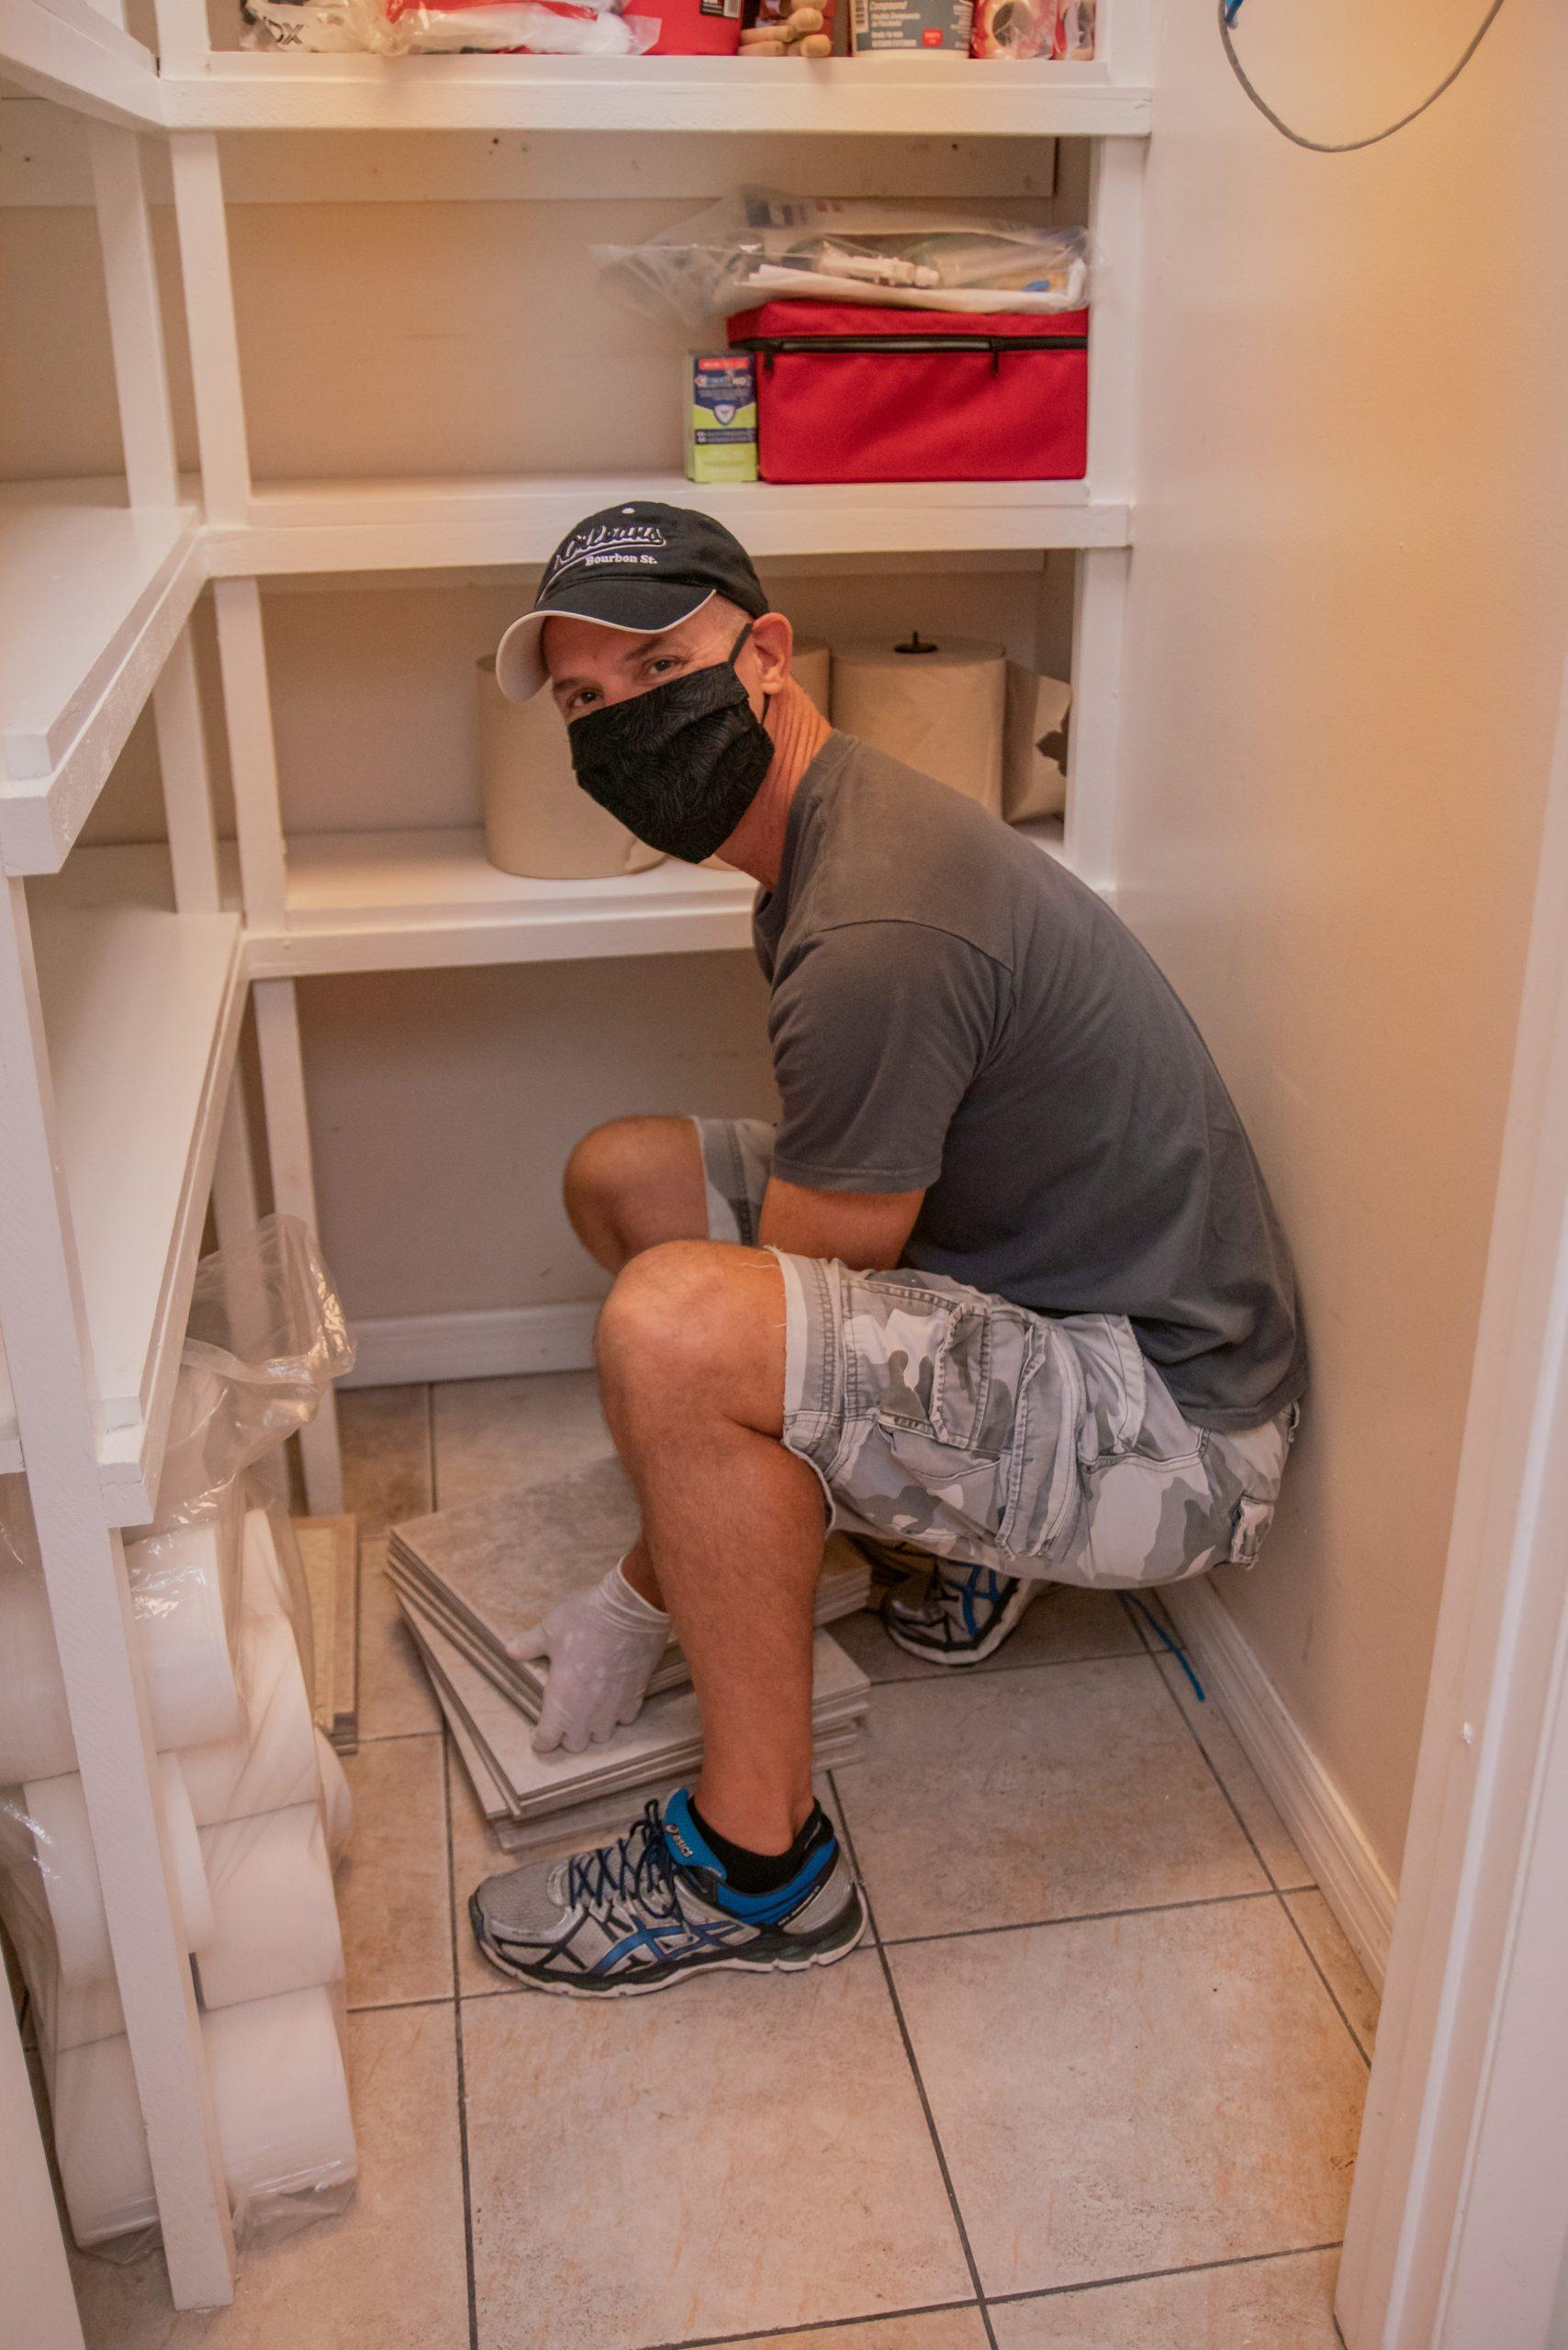 A volunteer organizes the closet